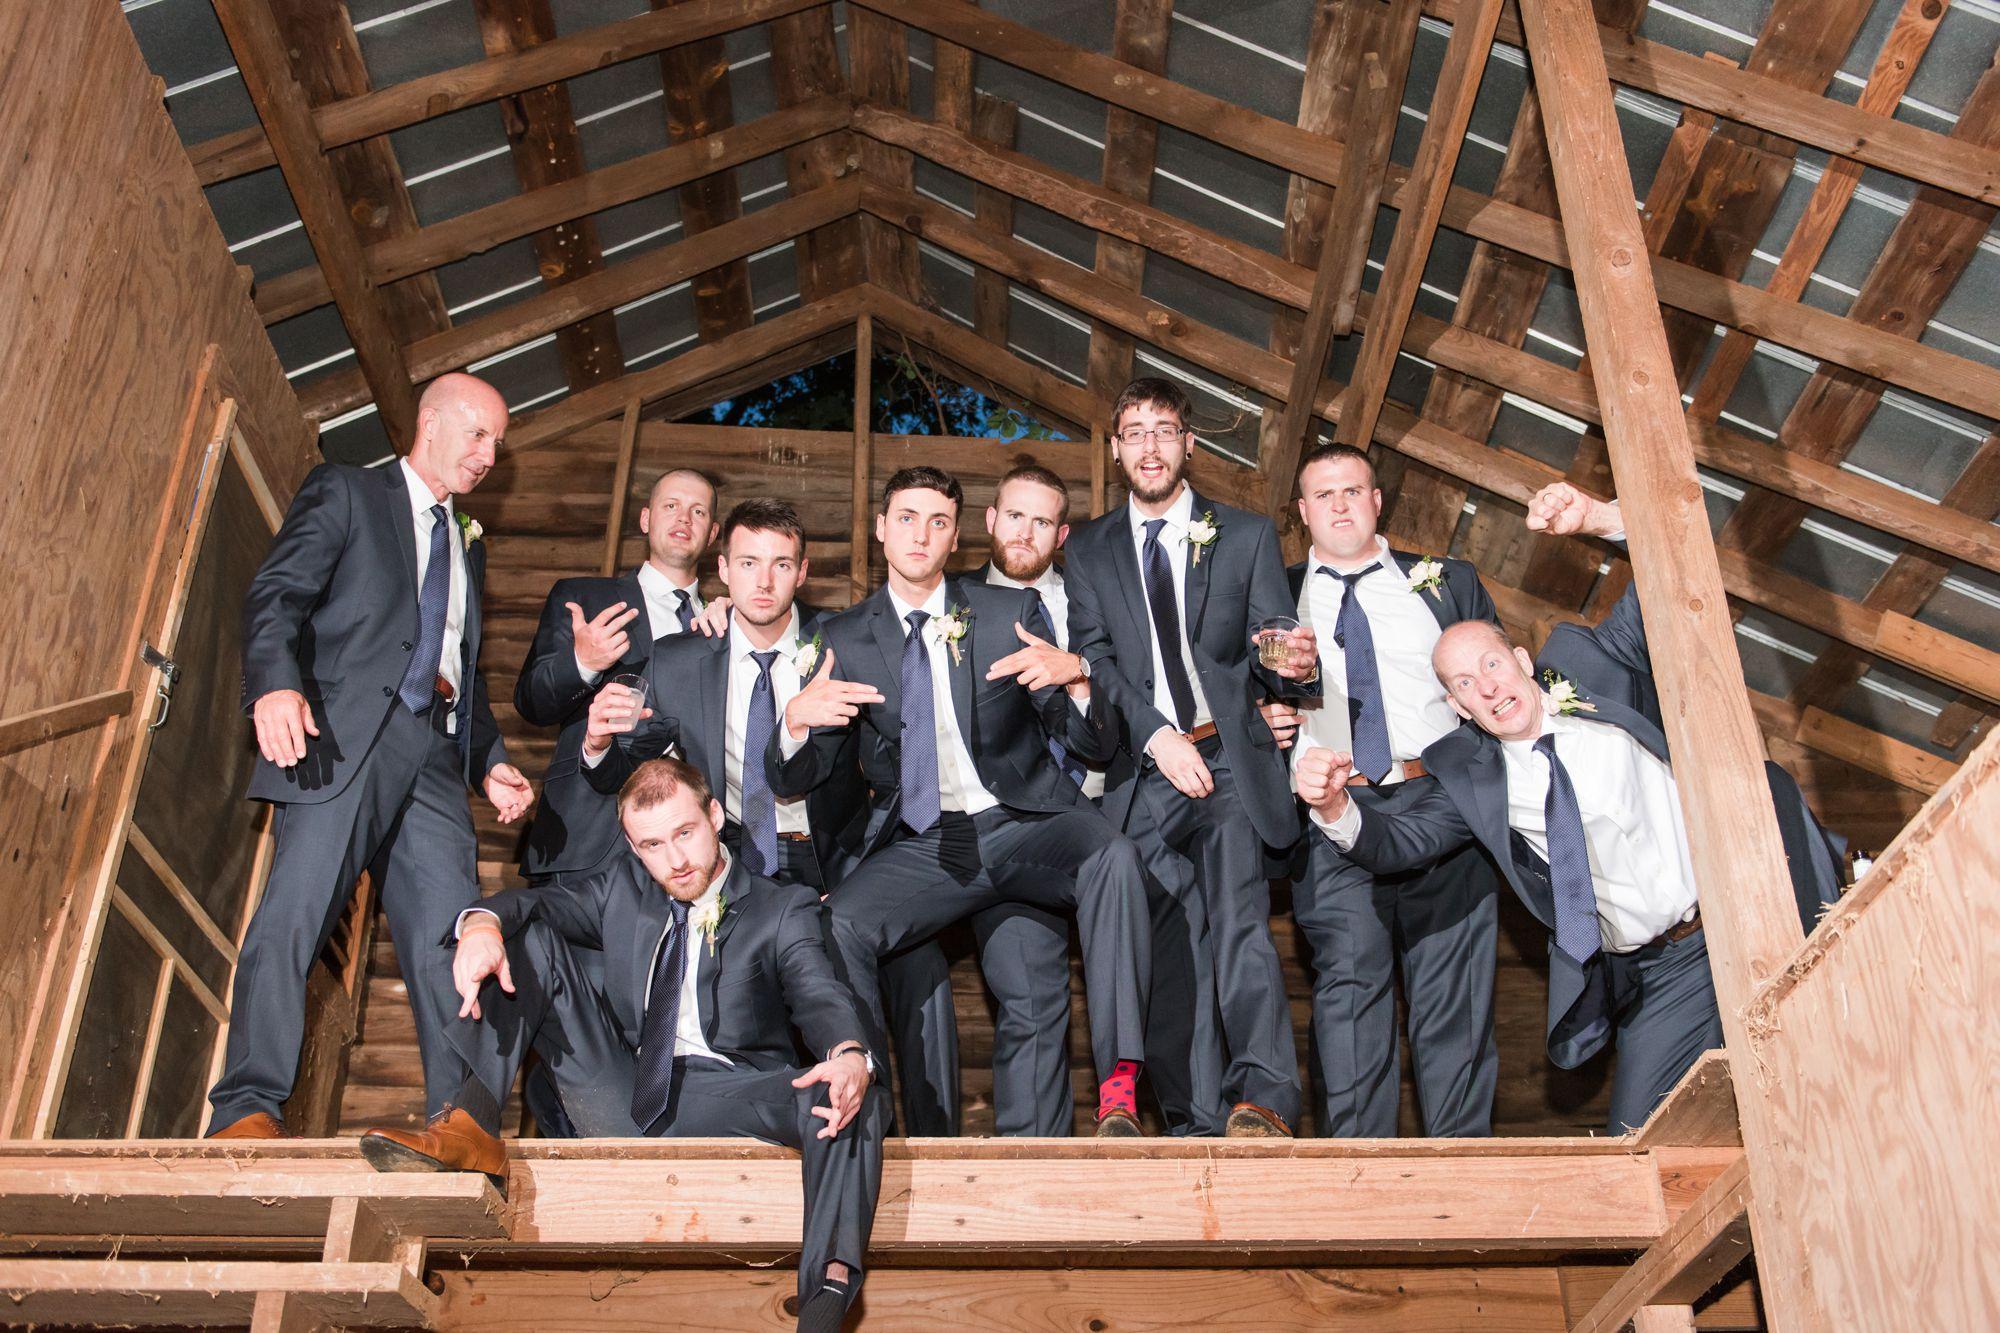 beaver-dam-house-davidson-nc-wedding-photos 104